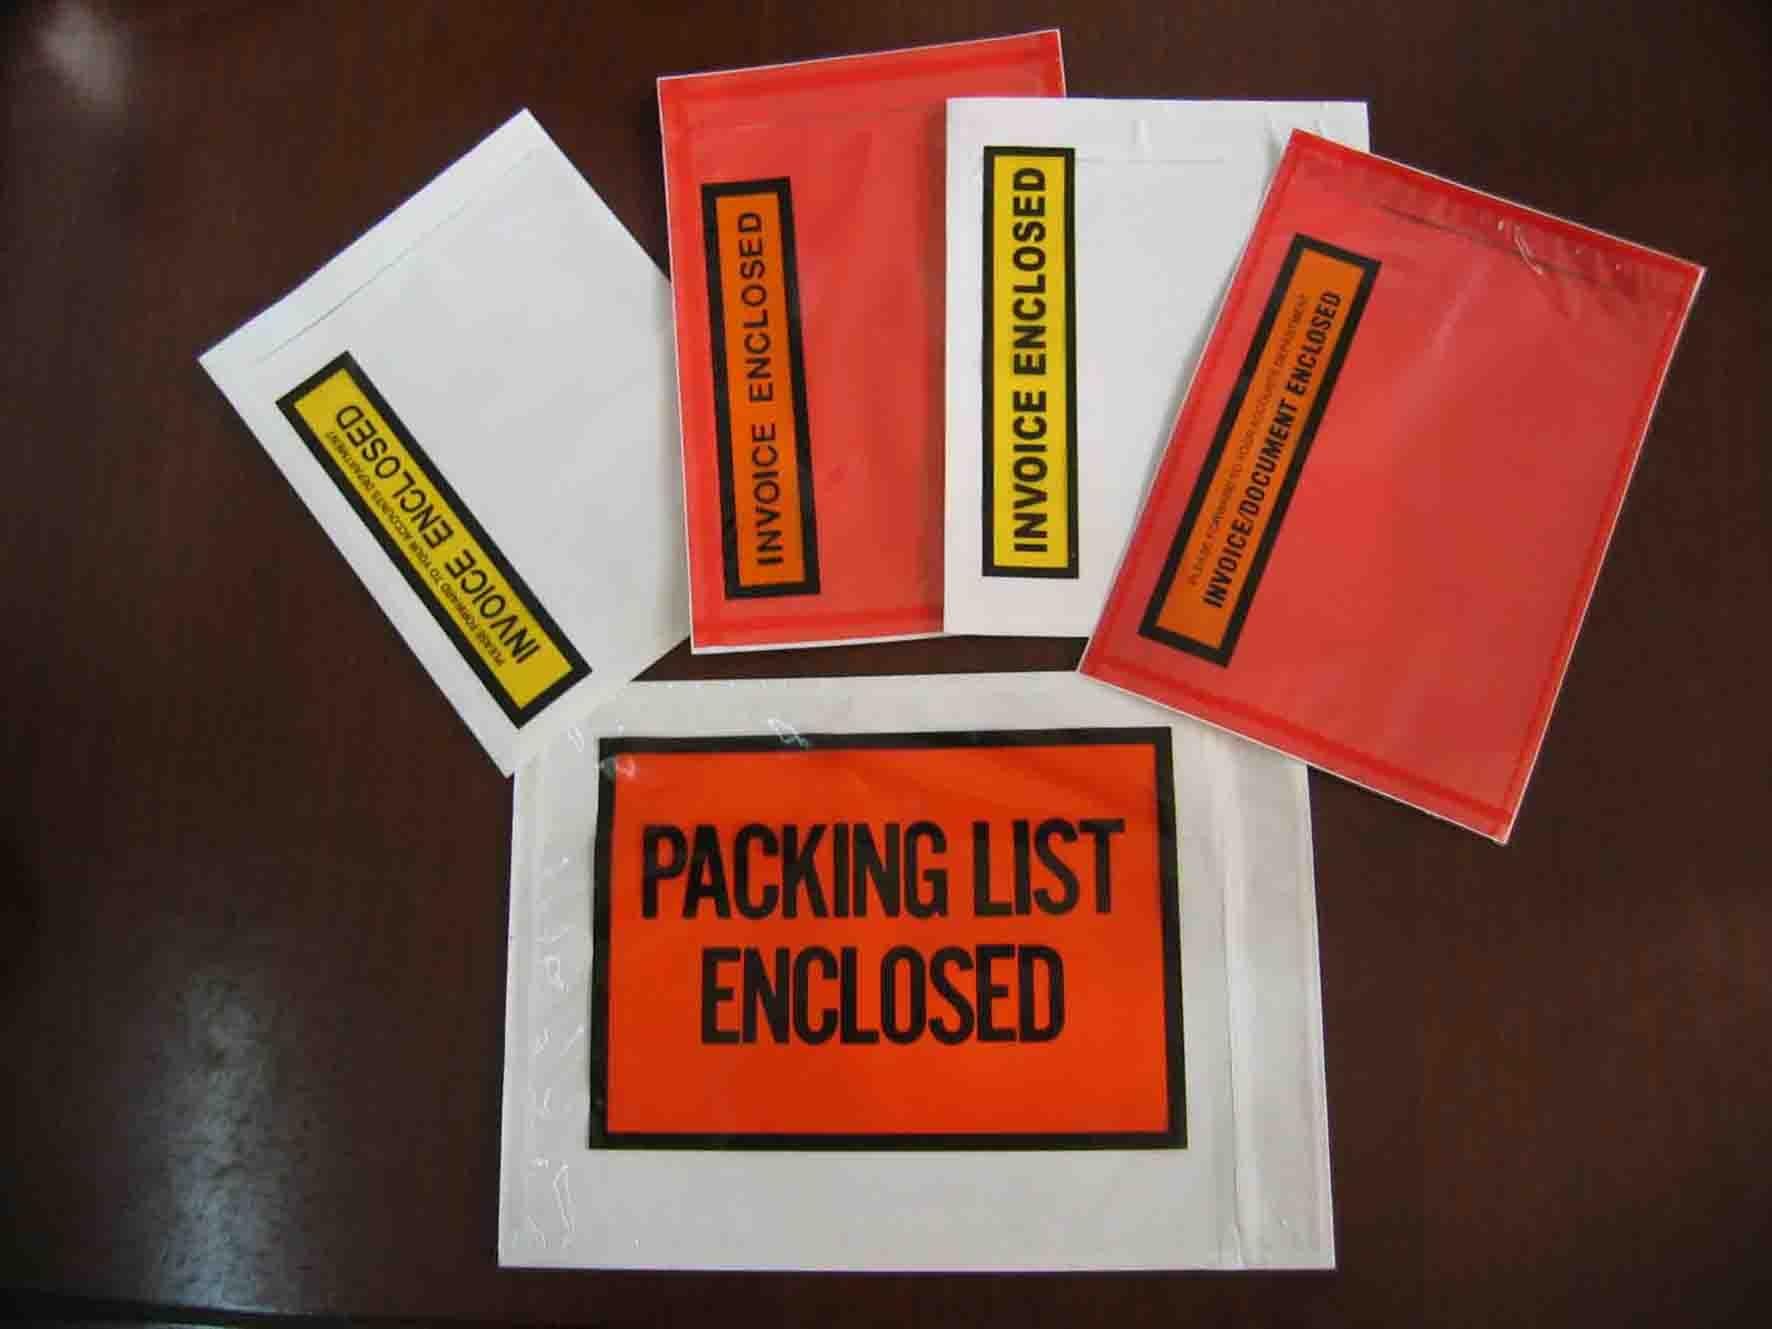 packing slip envelopeinvoice encloseddocuments enclosed from invoice packing slip